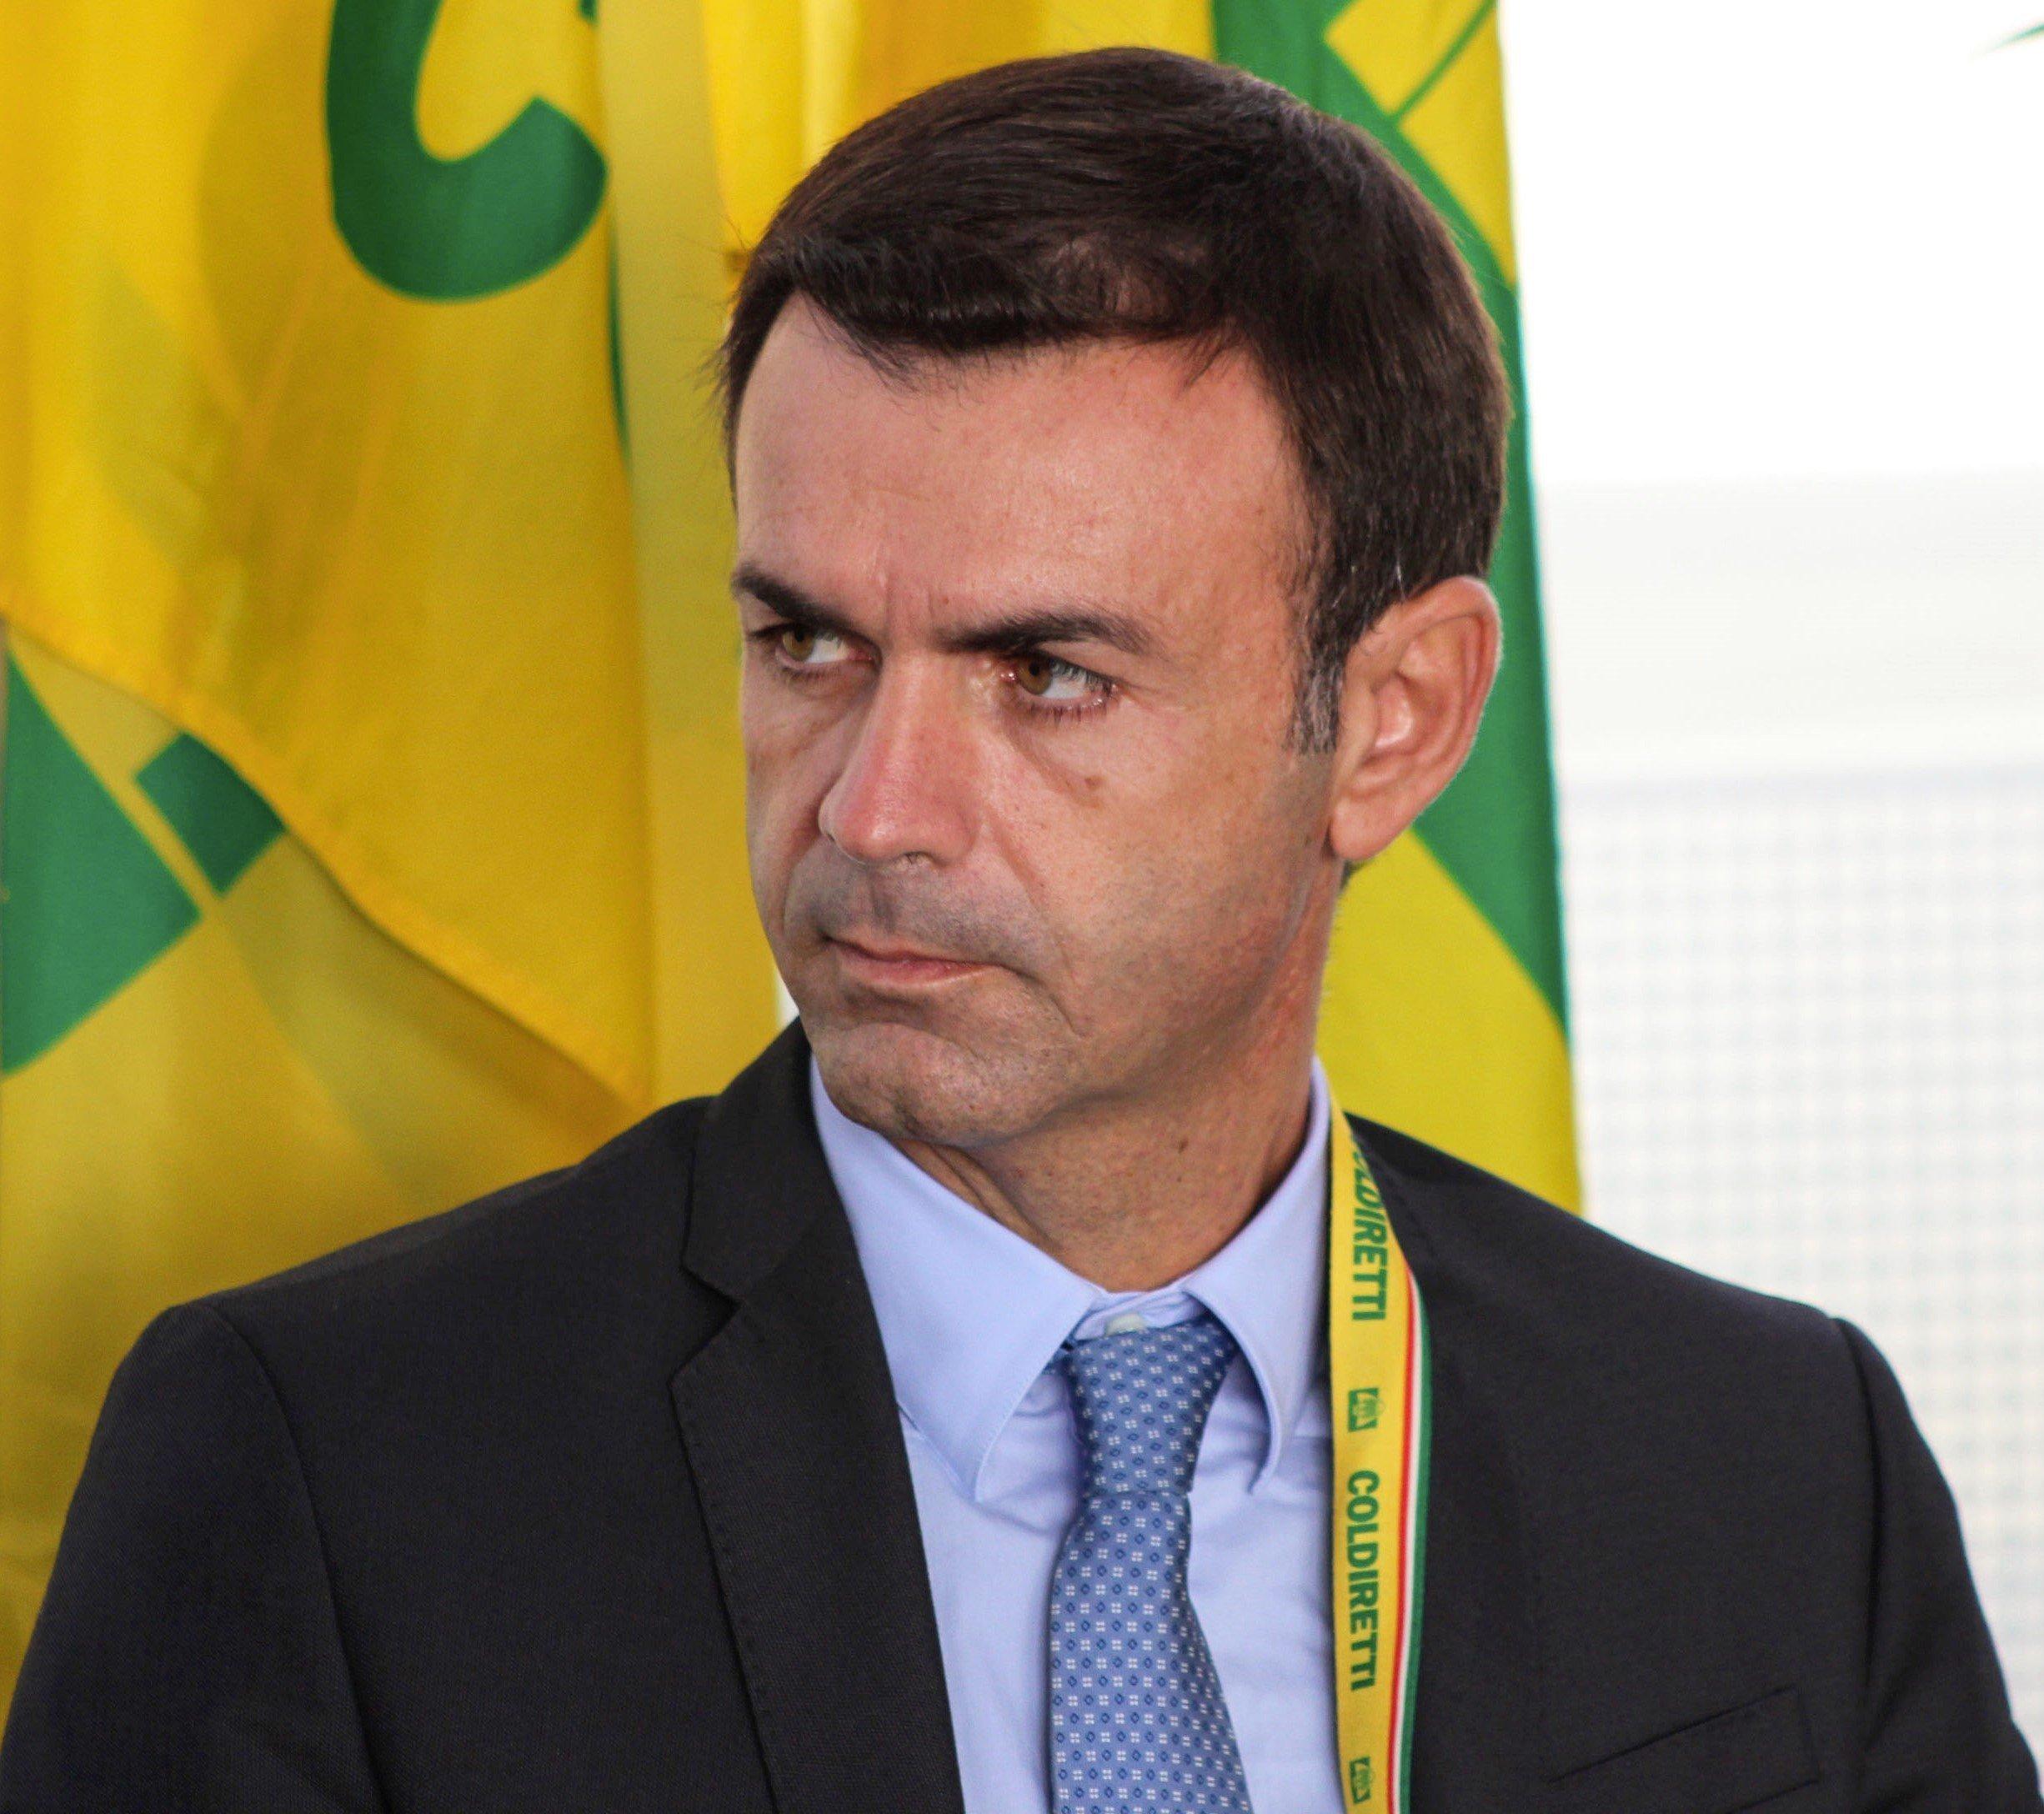 Ettore Prandini, président de Coldiretti, syndicat agricole d'Italie